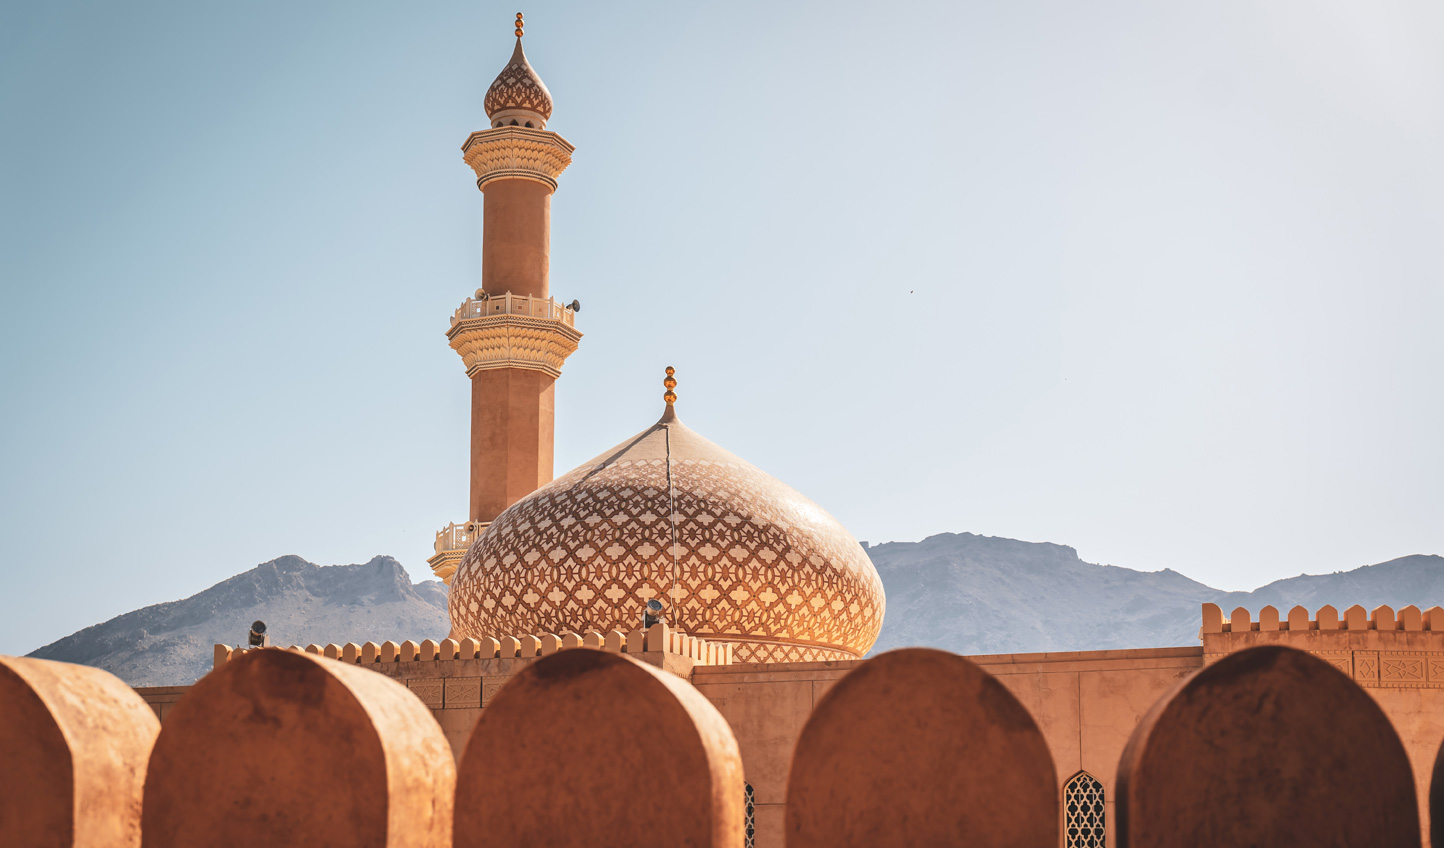 Stunning architecture set against a mountainous backdrop